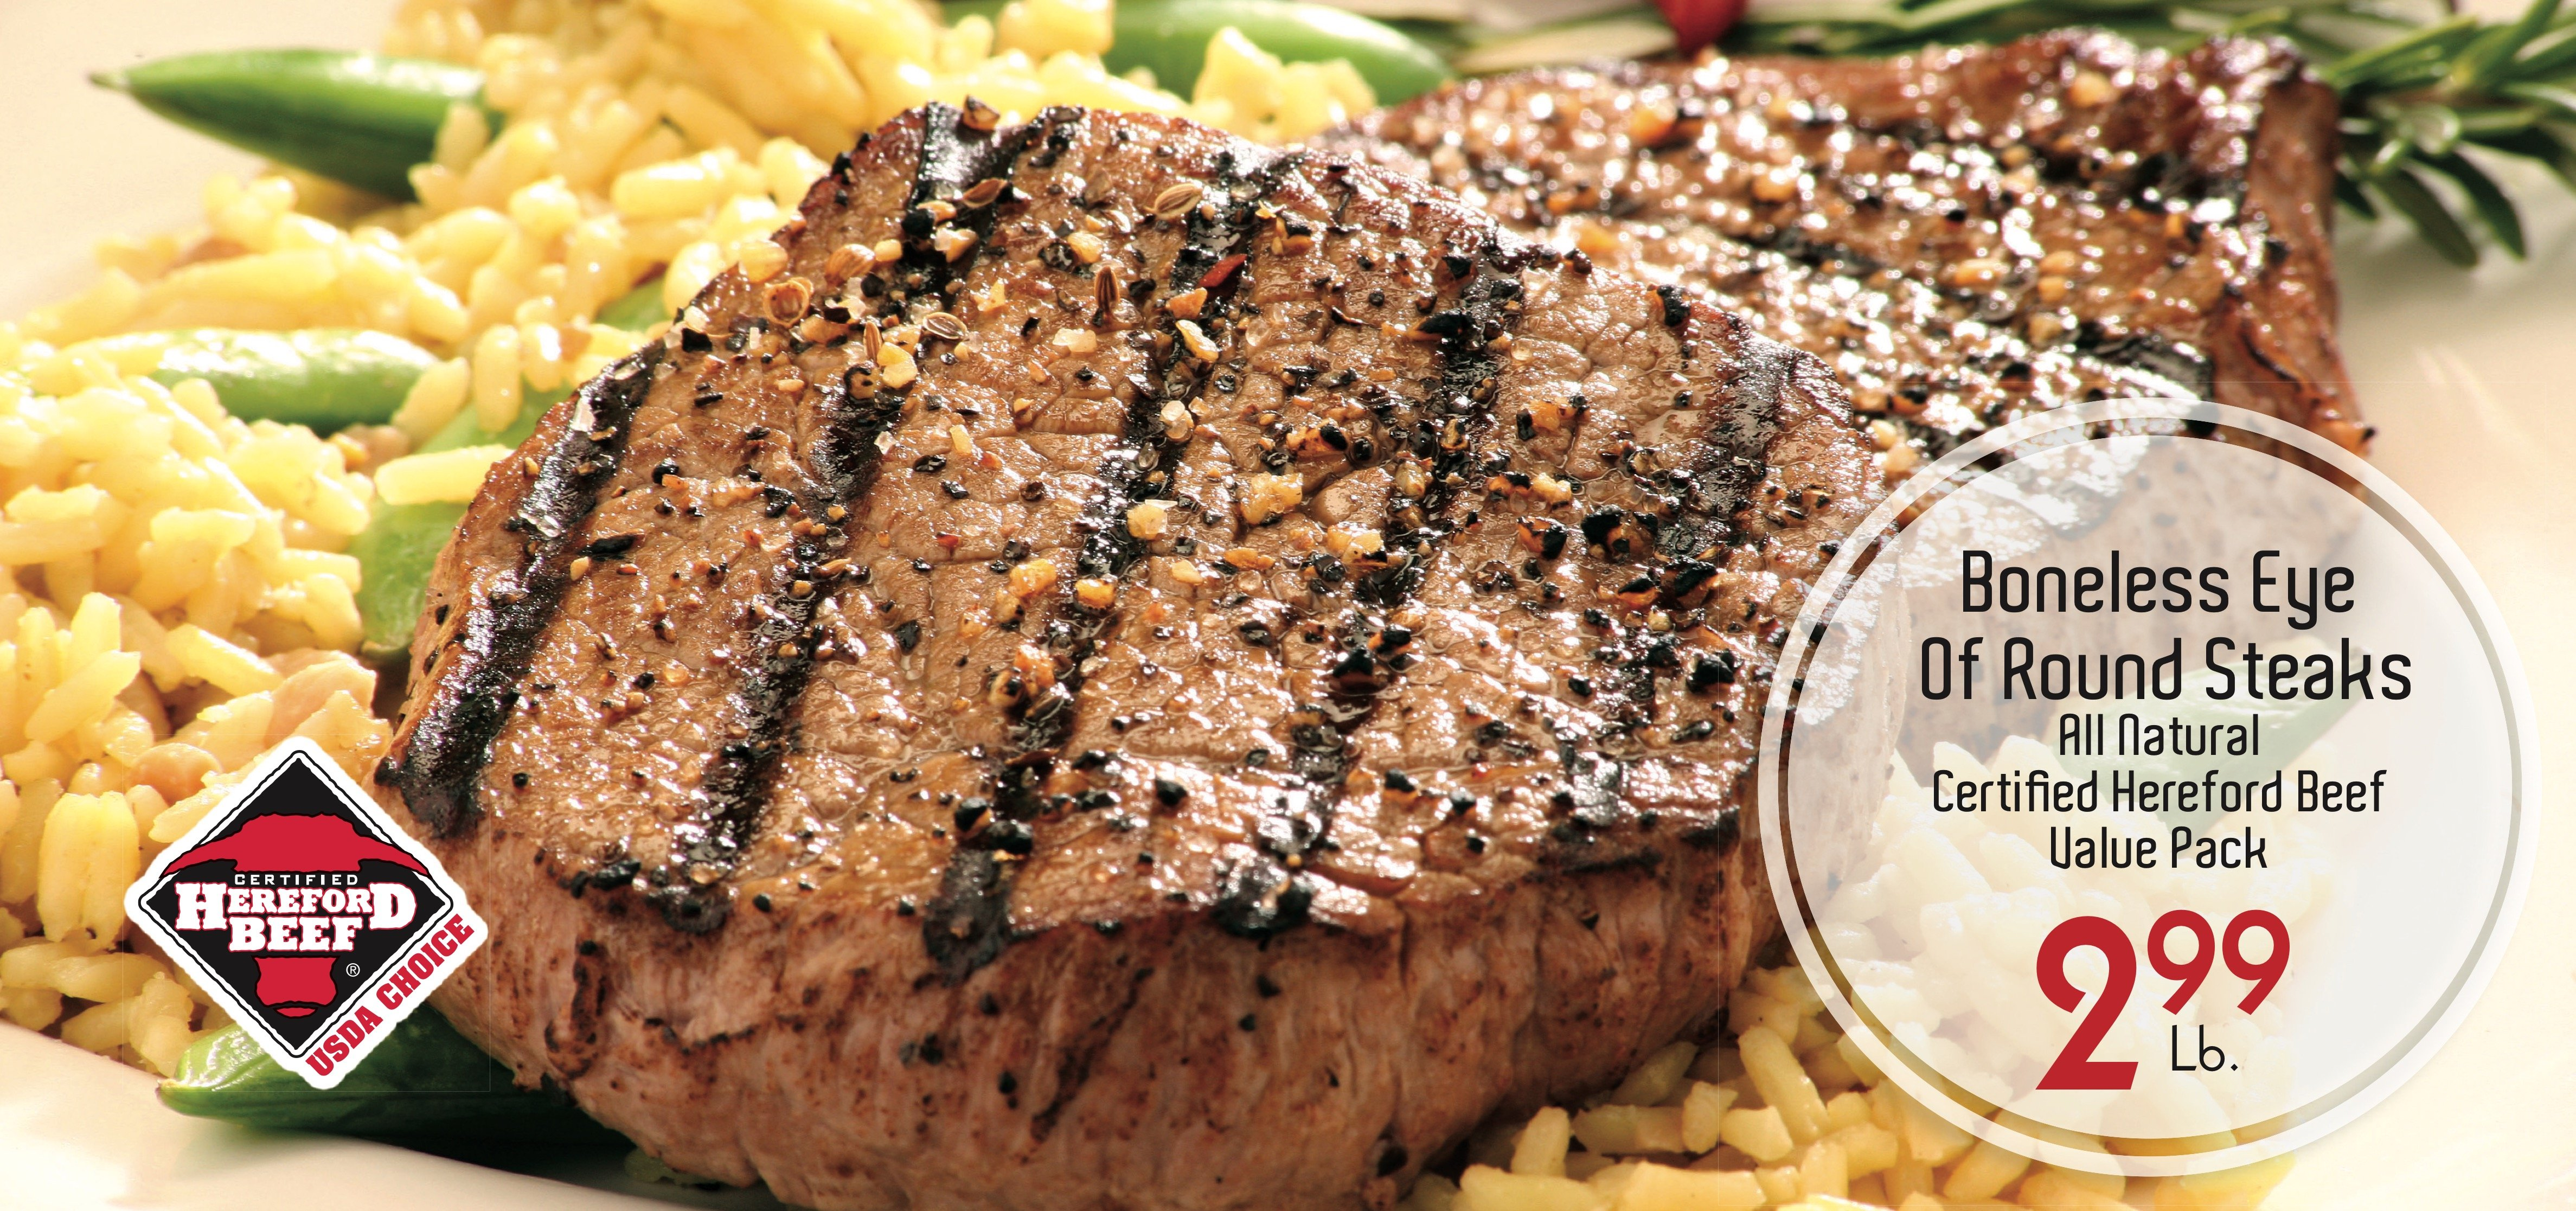 Boneless Eye of Round Steaks